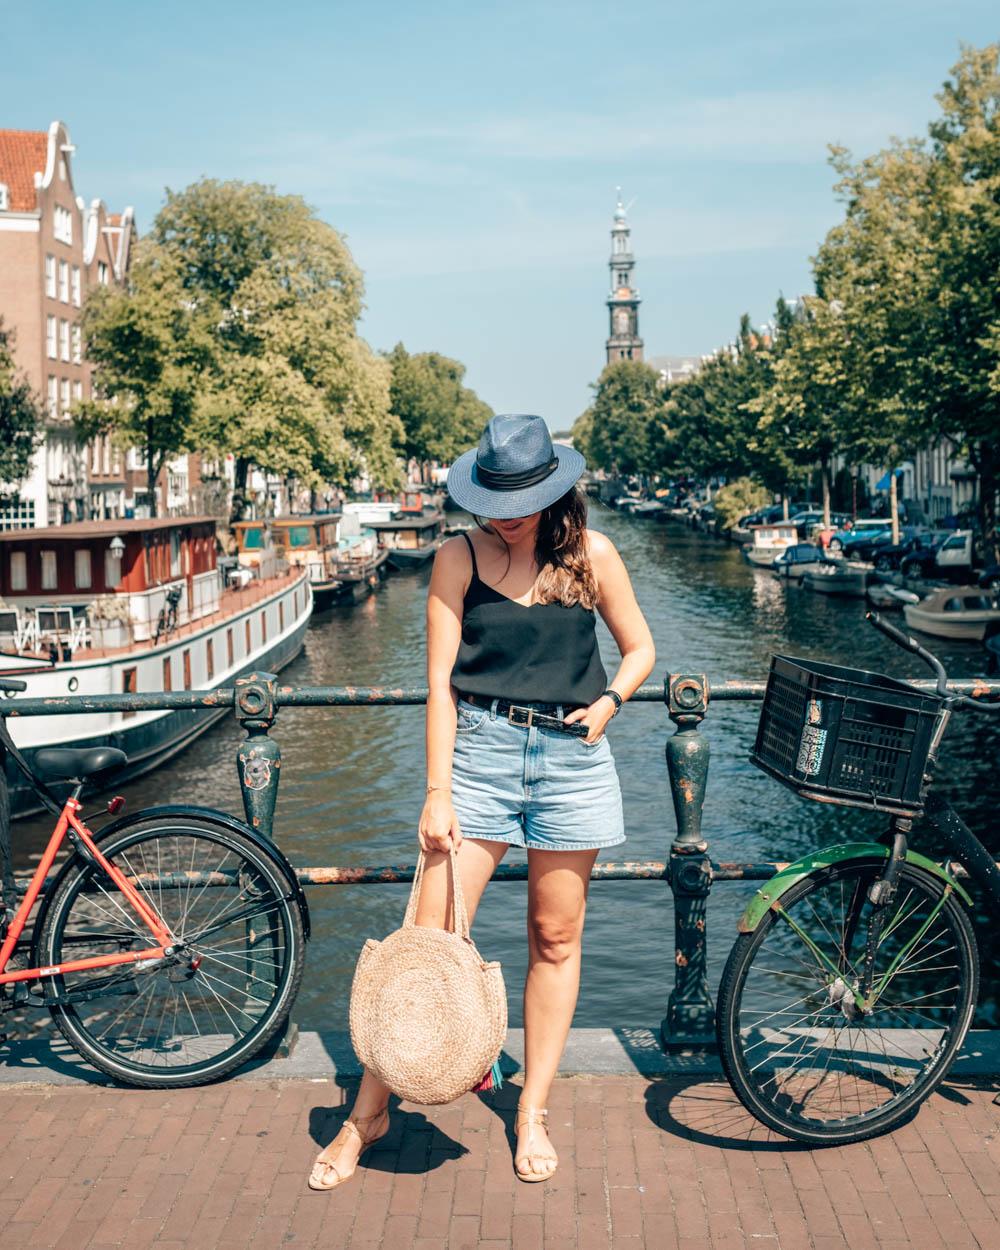 Netherlands 2 days in Amsterdam